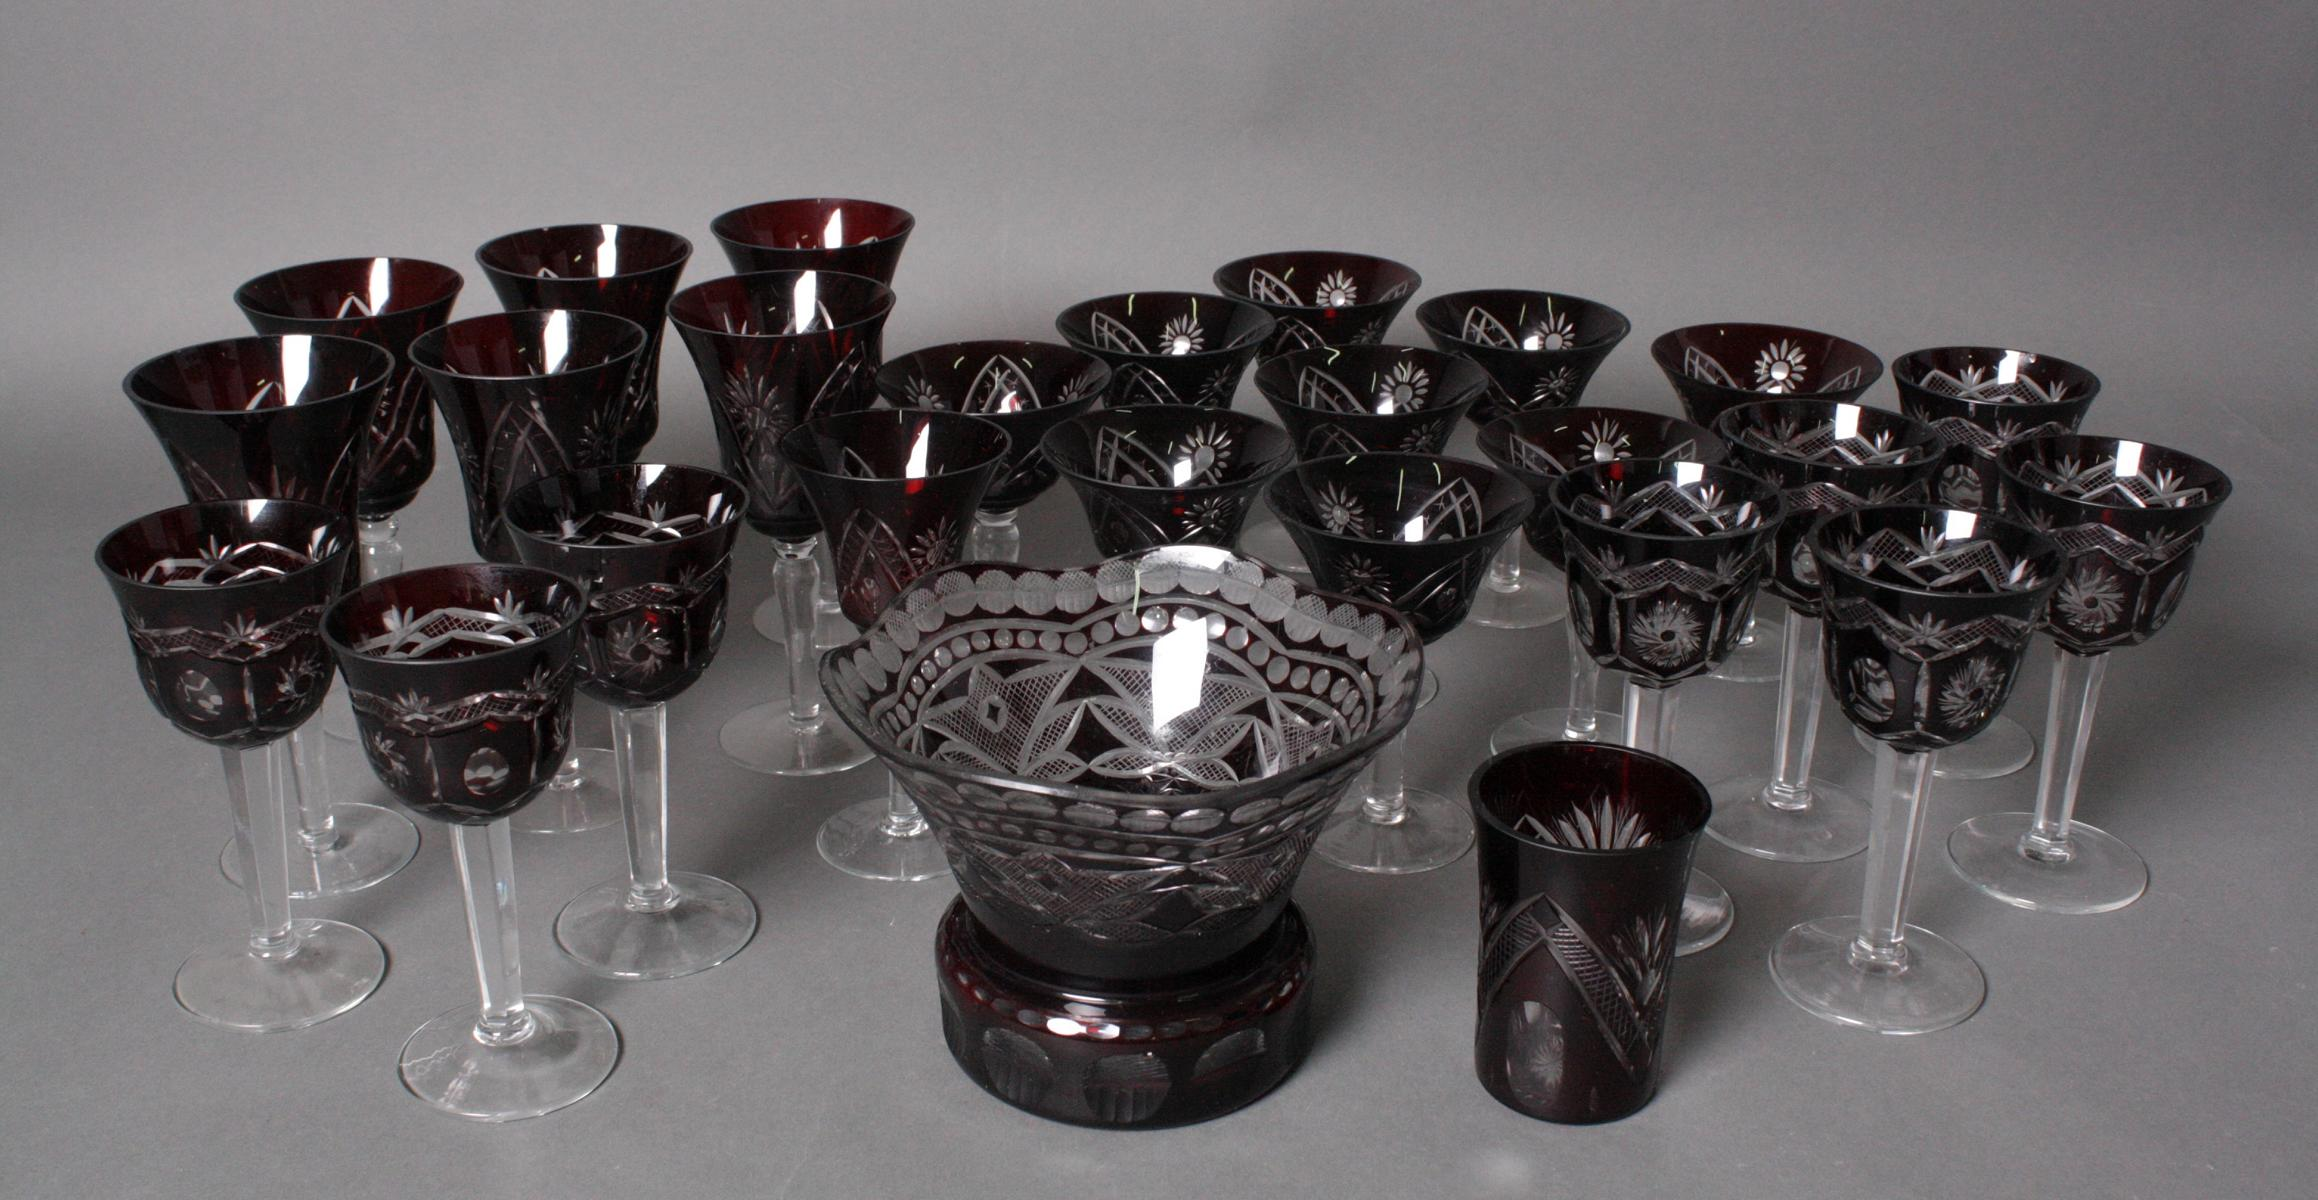 Konvolut Kristall-Gläser, 26-teilig, 20. Jahrhundert